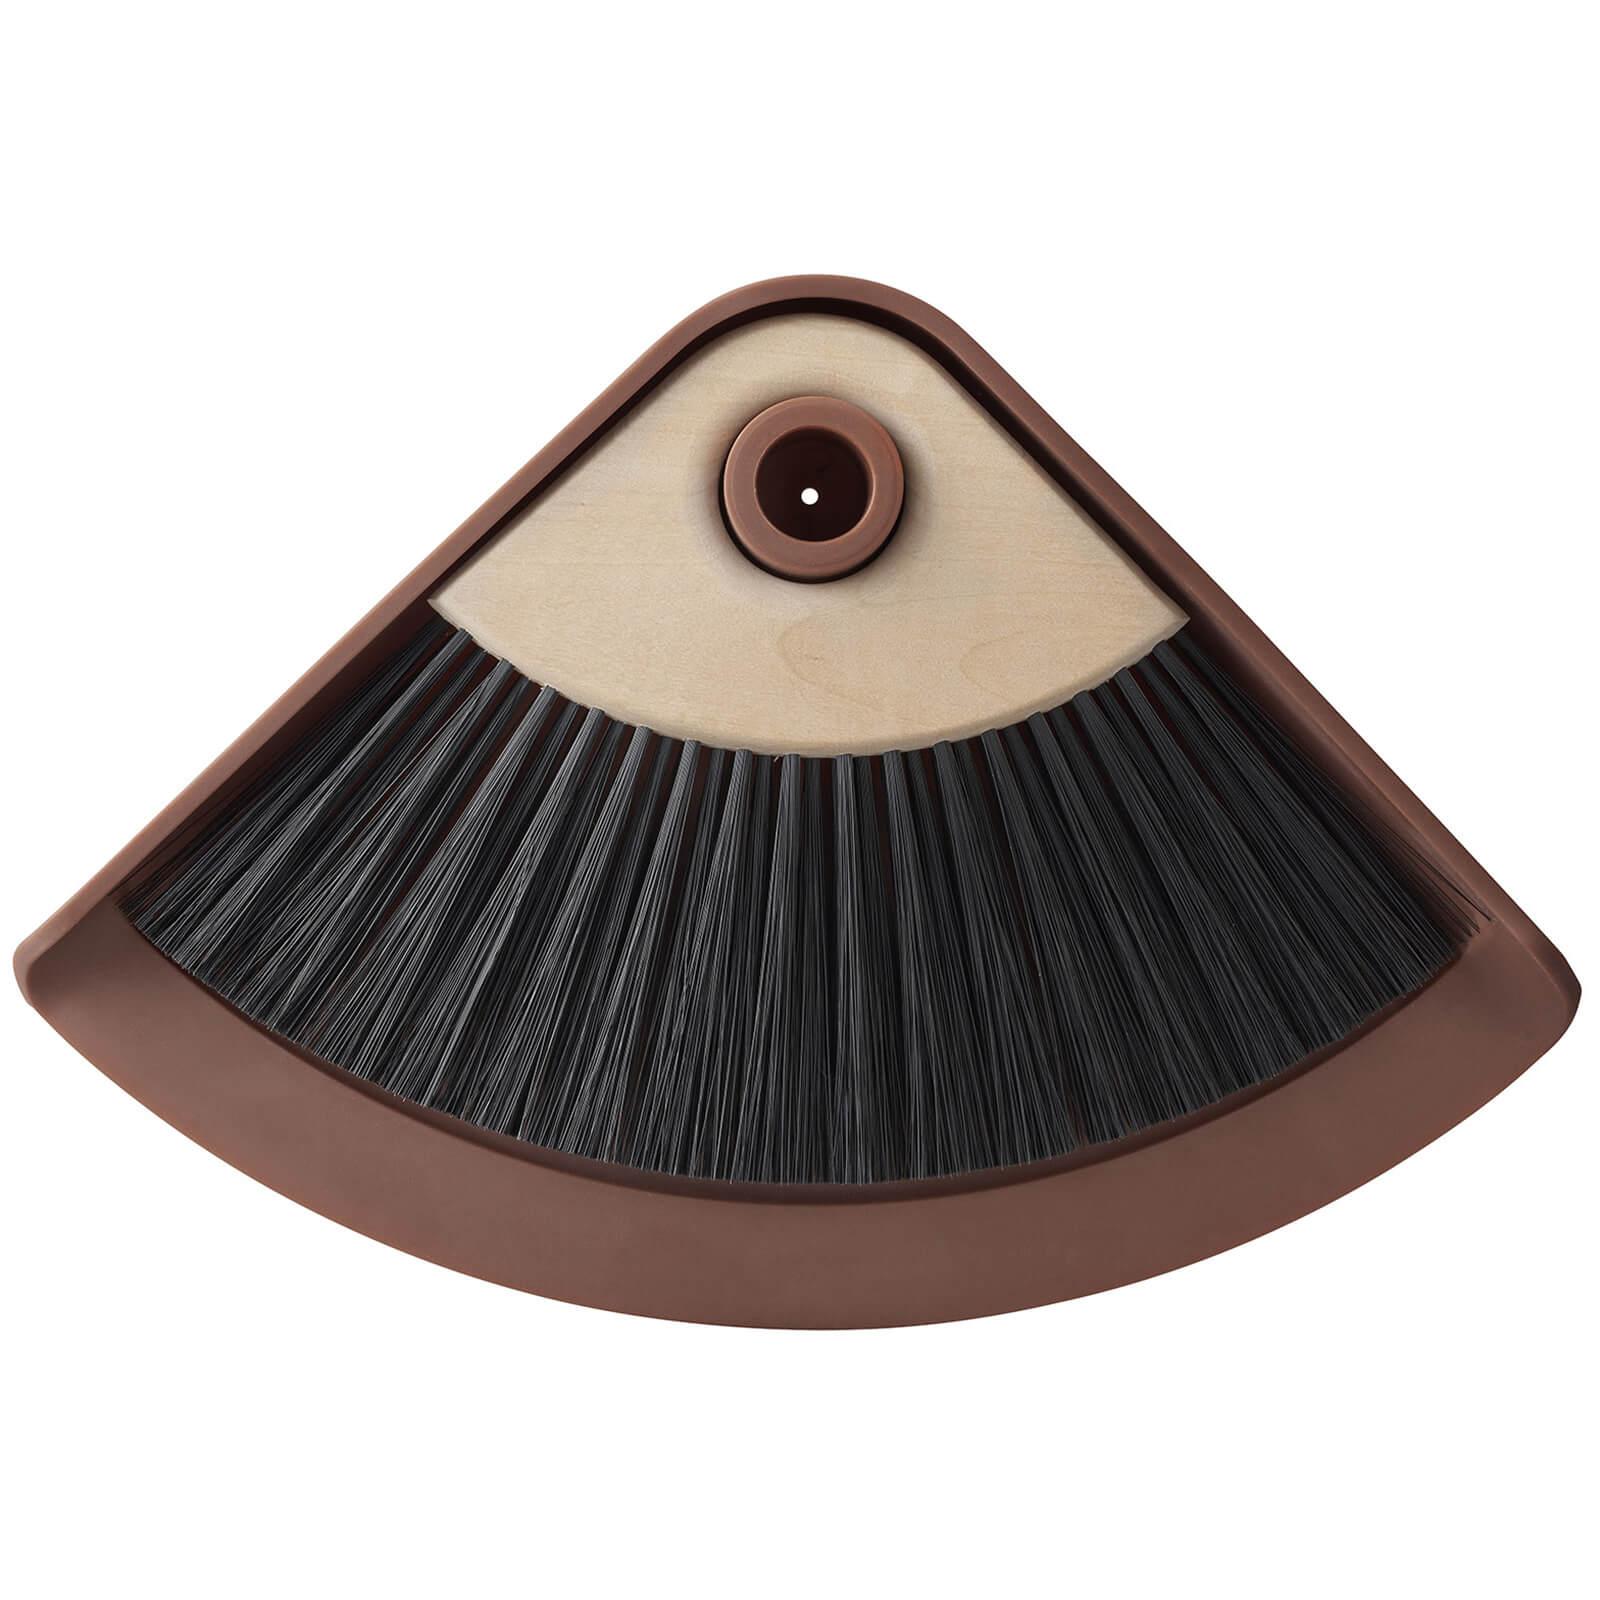 RIG-TIG Sweep-It Dustpan & Broom - Terracotta